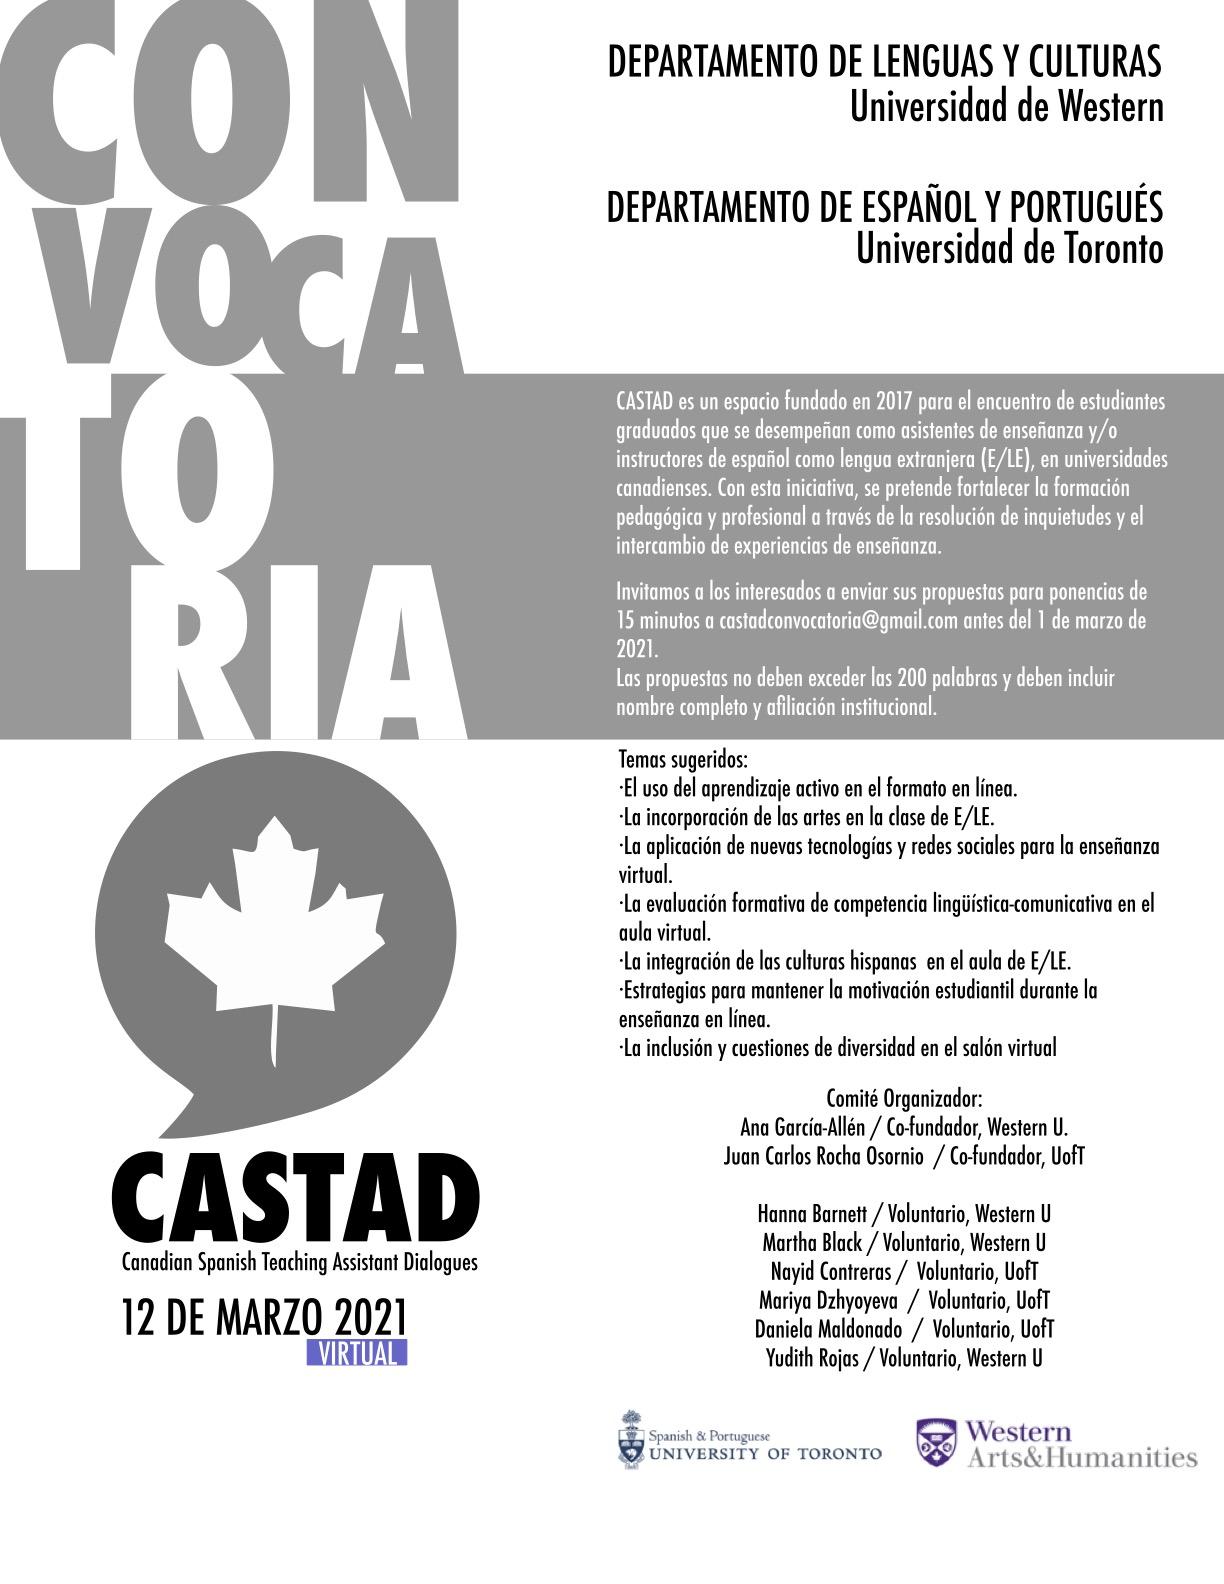 Convocatoria a CASTAD, 12 de marzo de 2021. Text reproduced in its entirety in the news article.